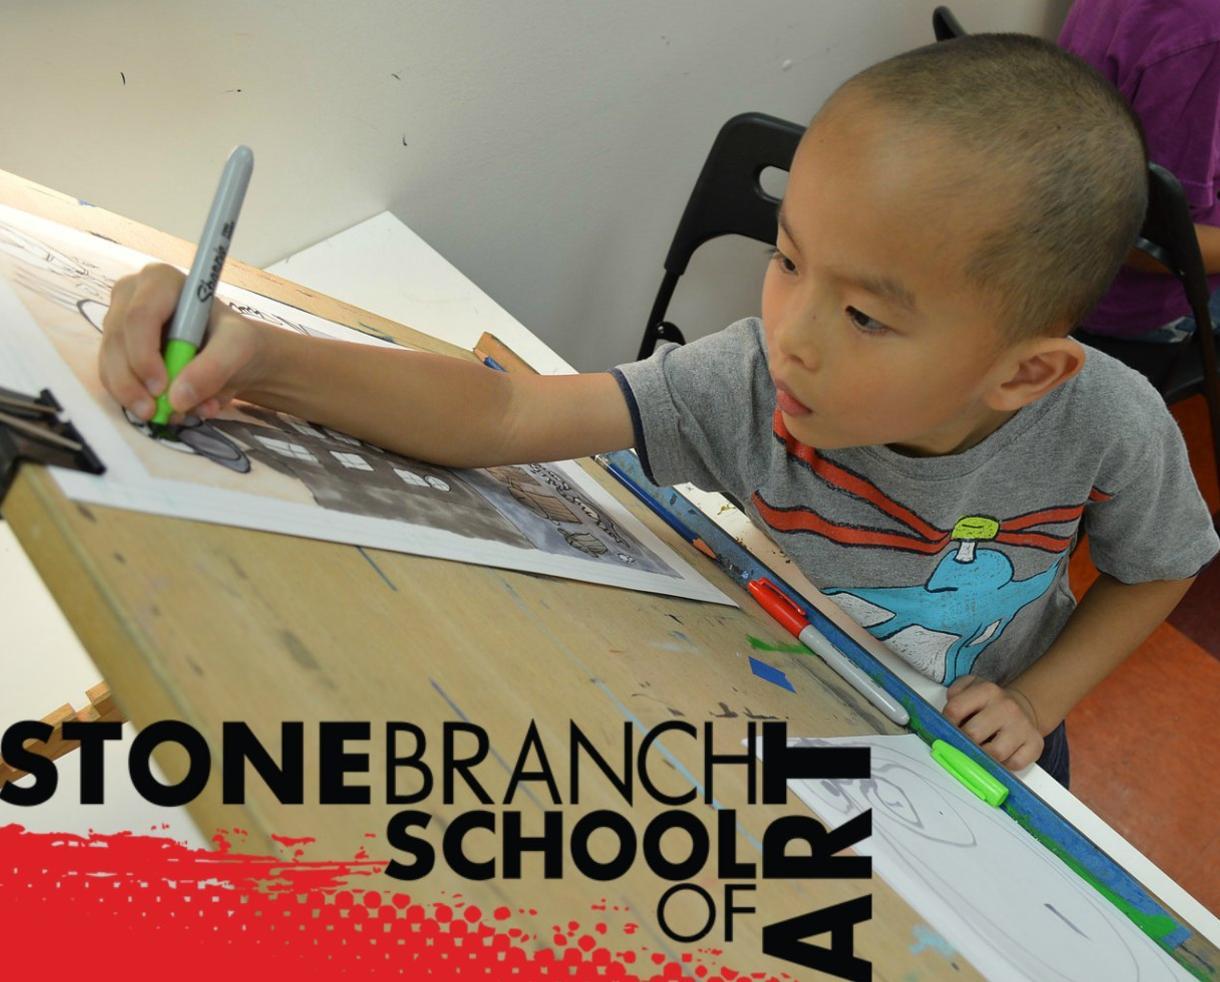 Stone Branch School of Art Camp